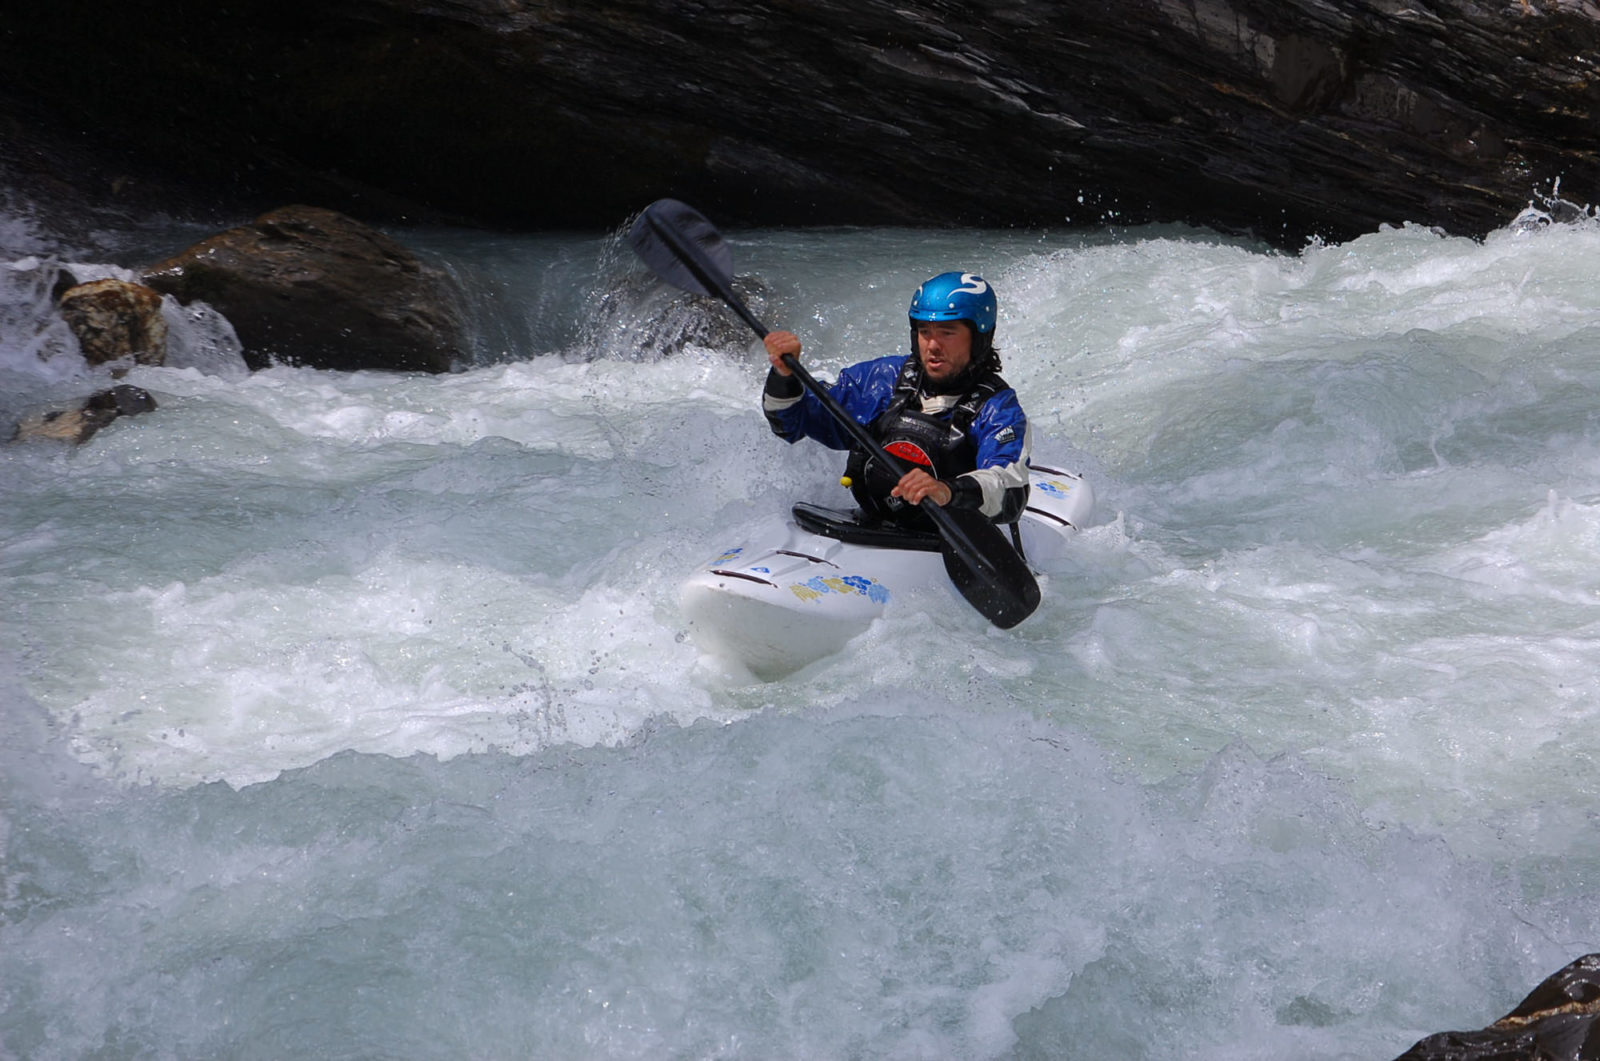 kanuschule_wildwasser-kajak-reise-engadin_holger-heuber-abenteuer